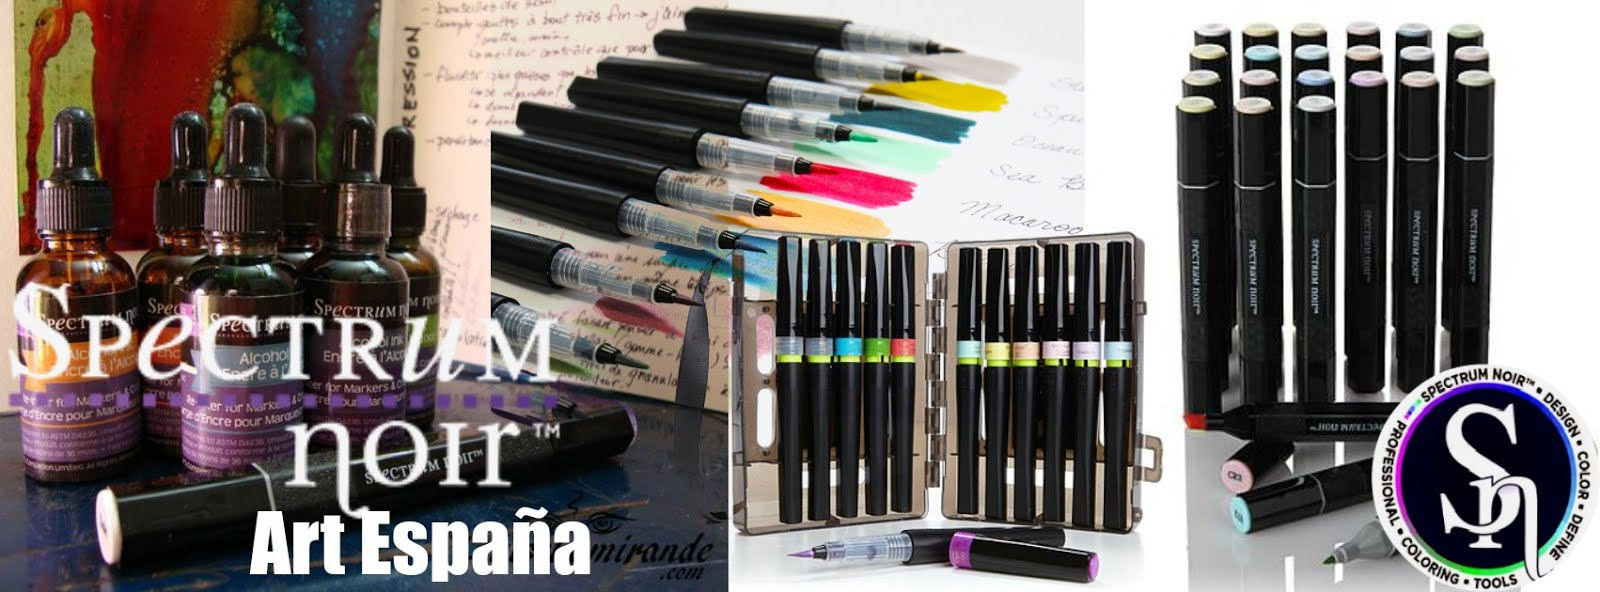 Spectrum Noir Art España